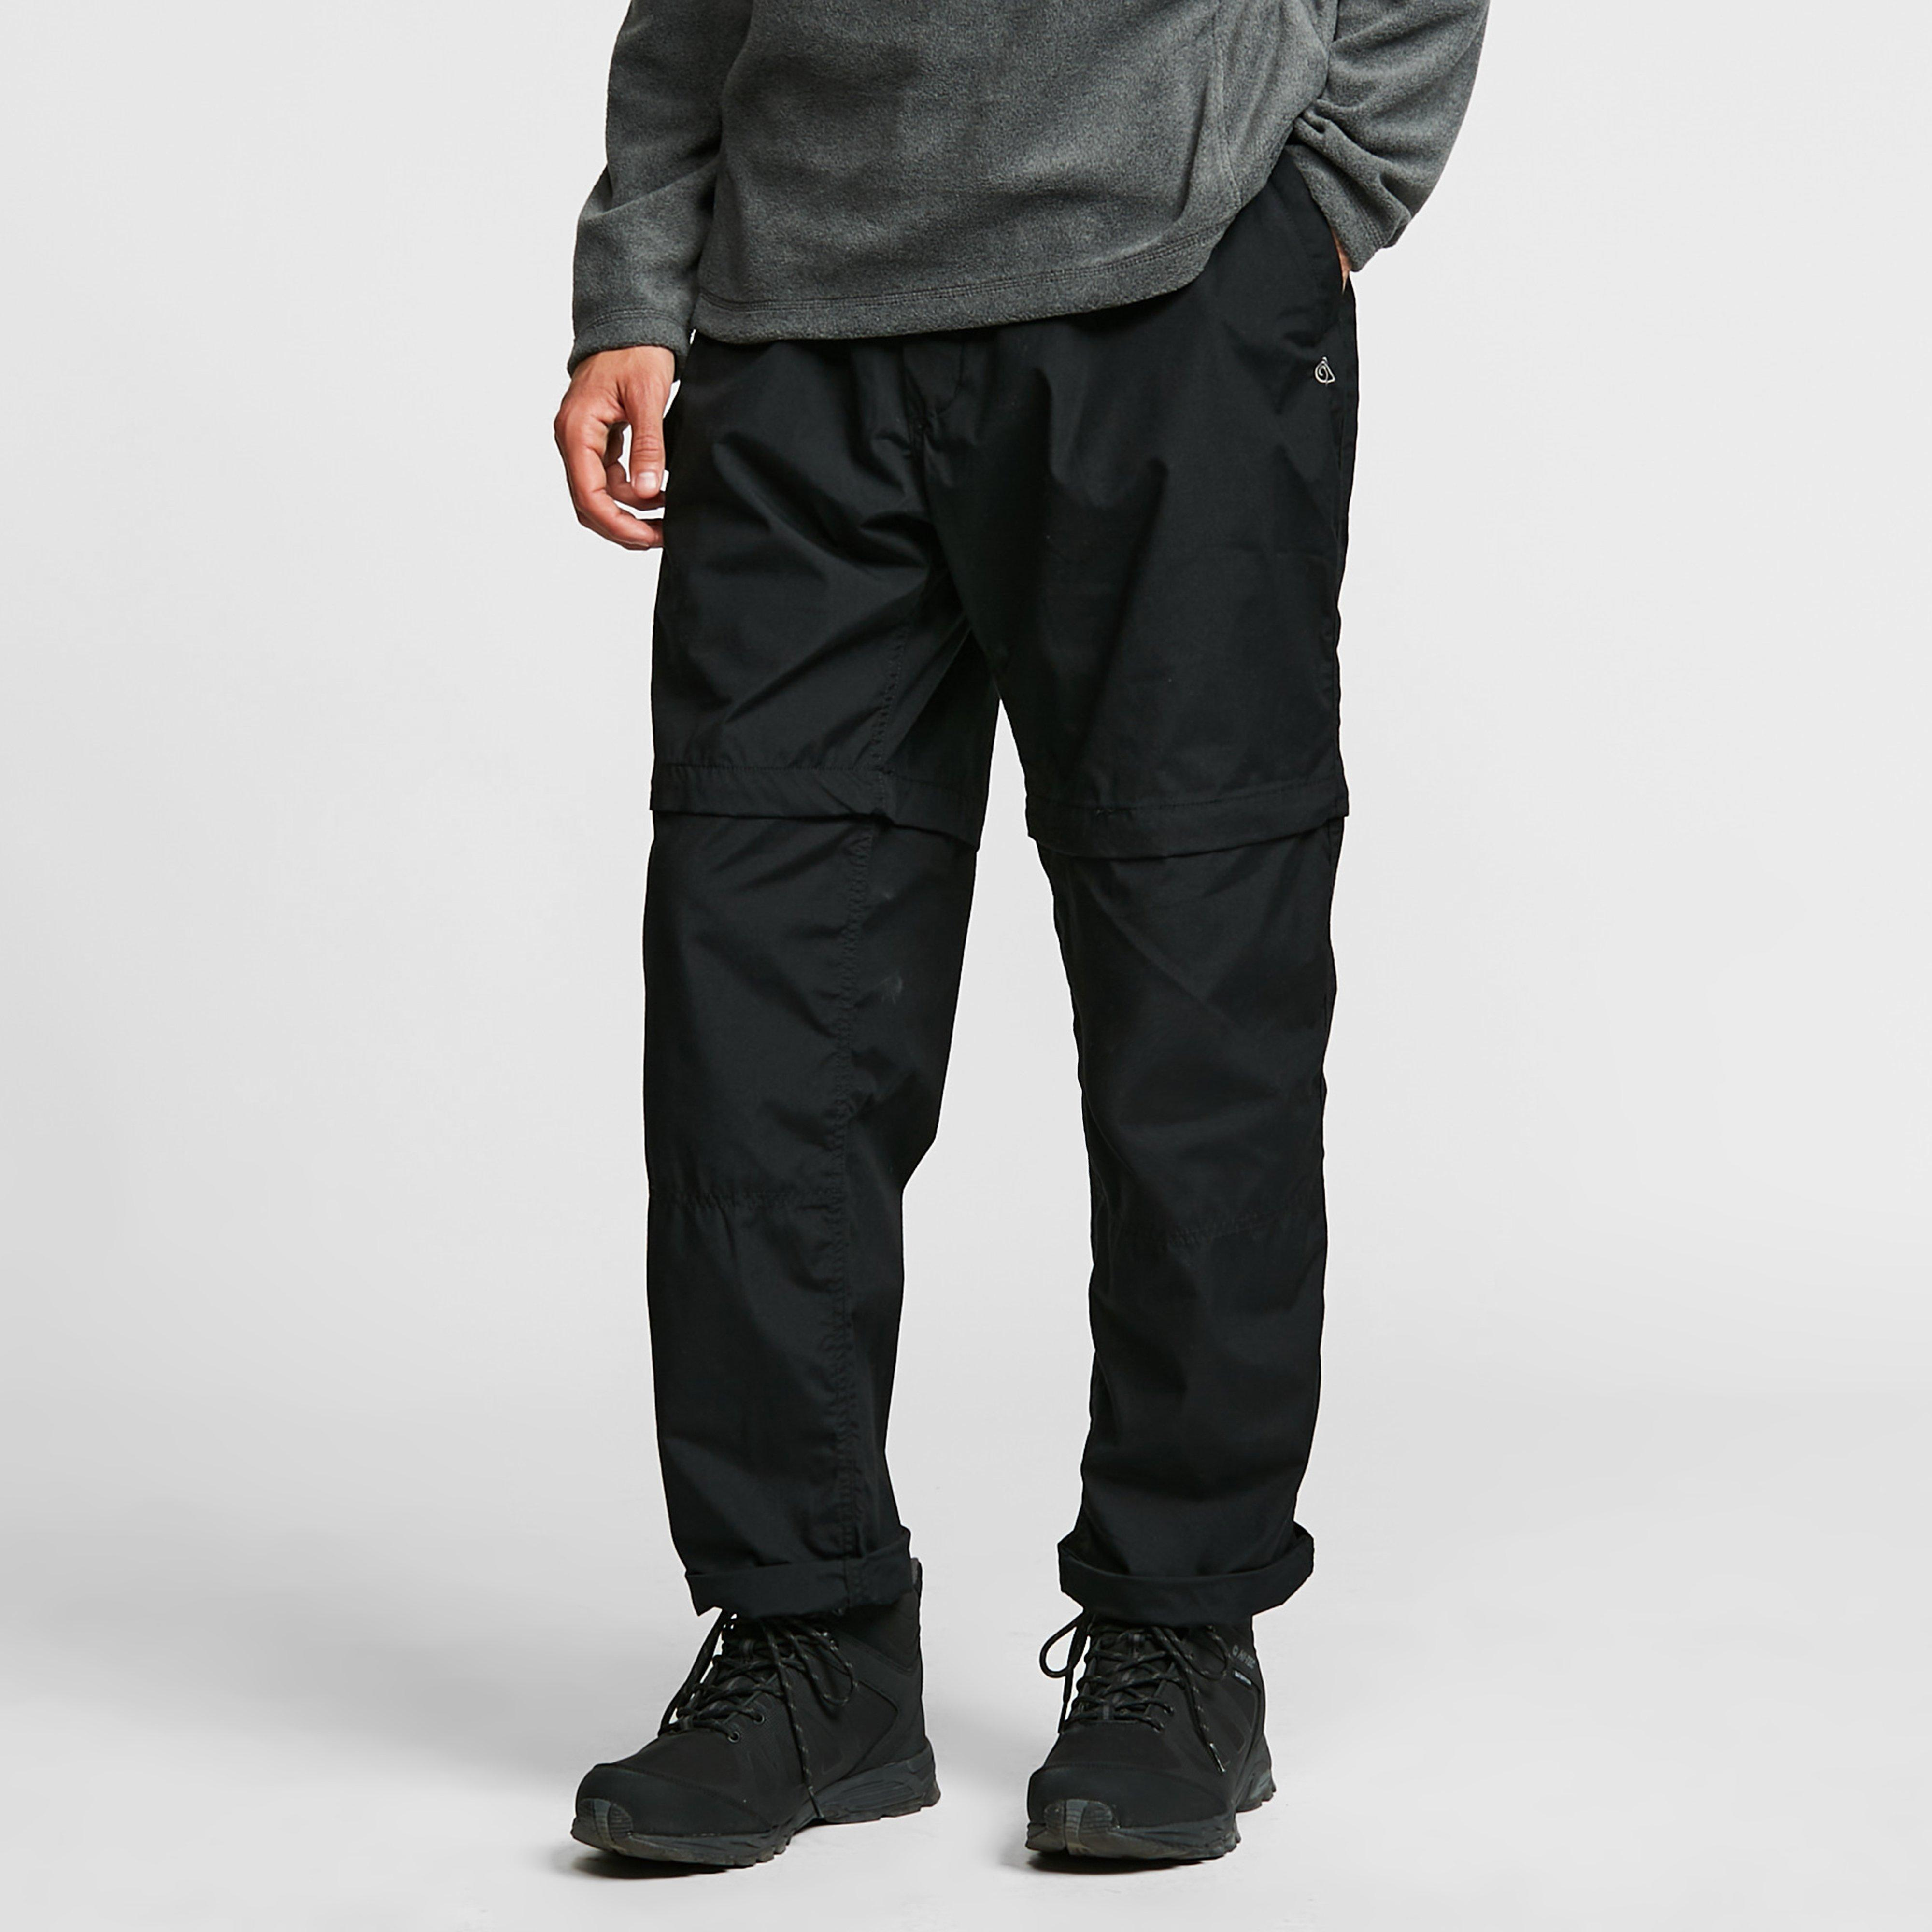 Craghoppers Mens Kiwi Convertible Trousers - Black/black  Black/black